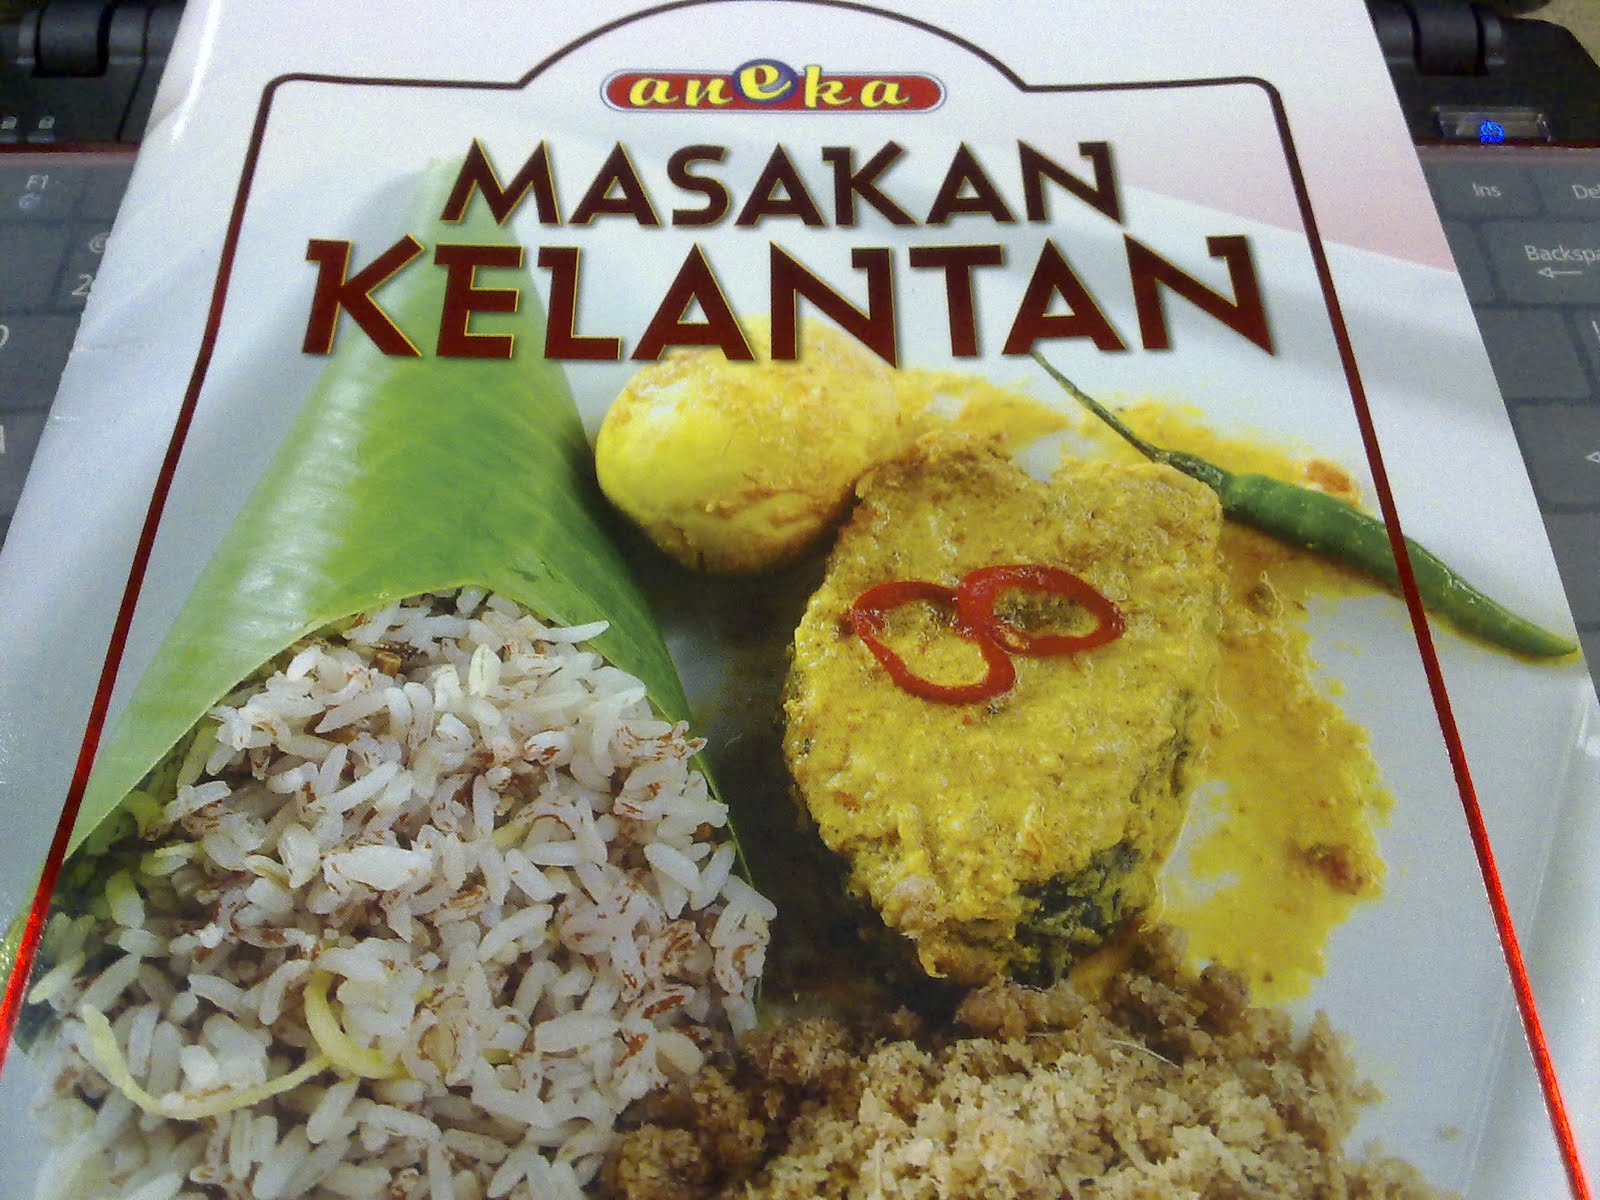 Buku Resepi Masakan Kelantan